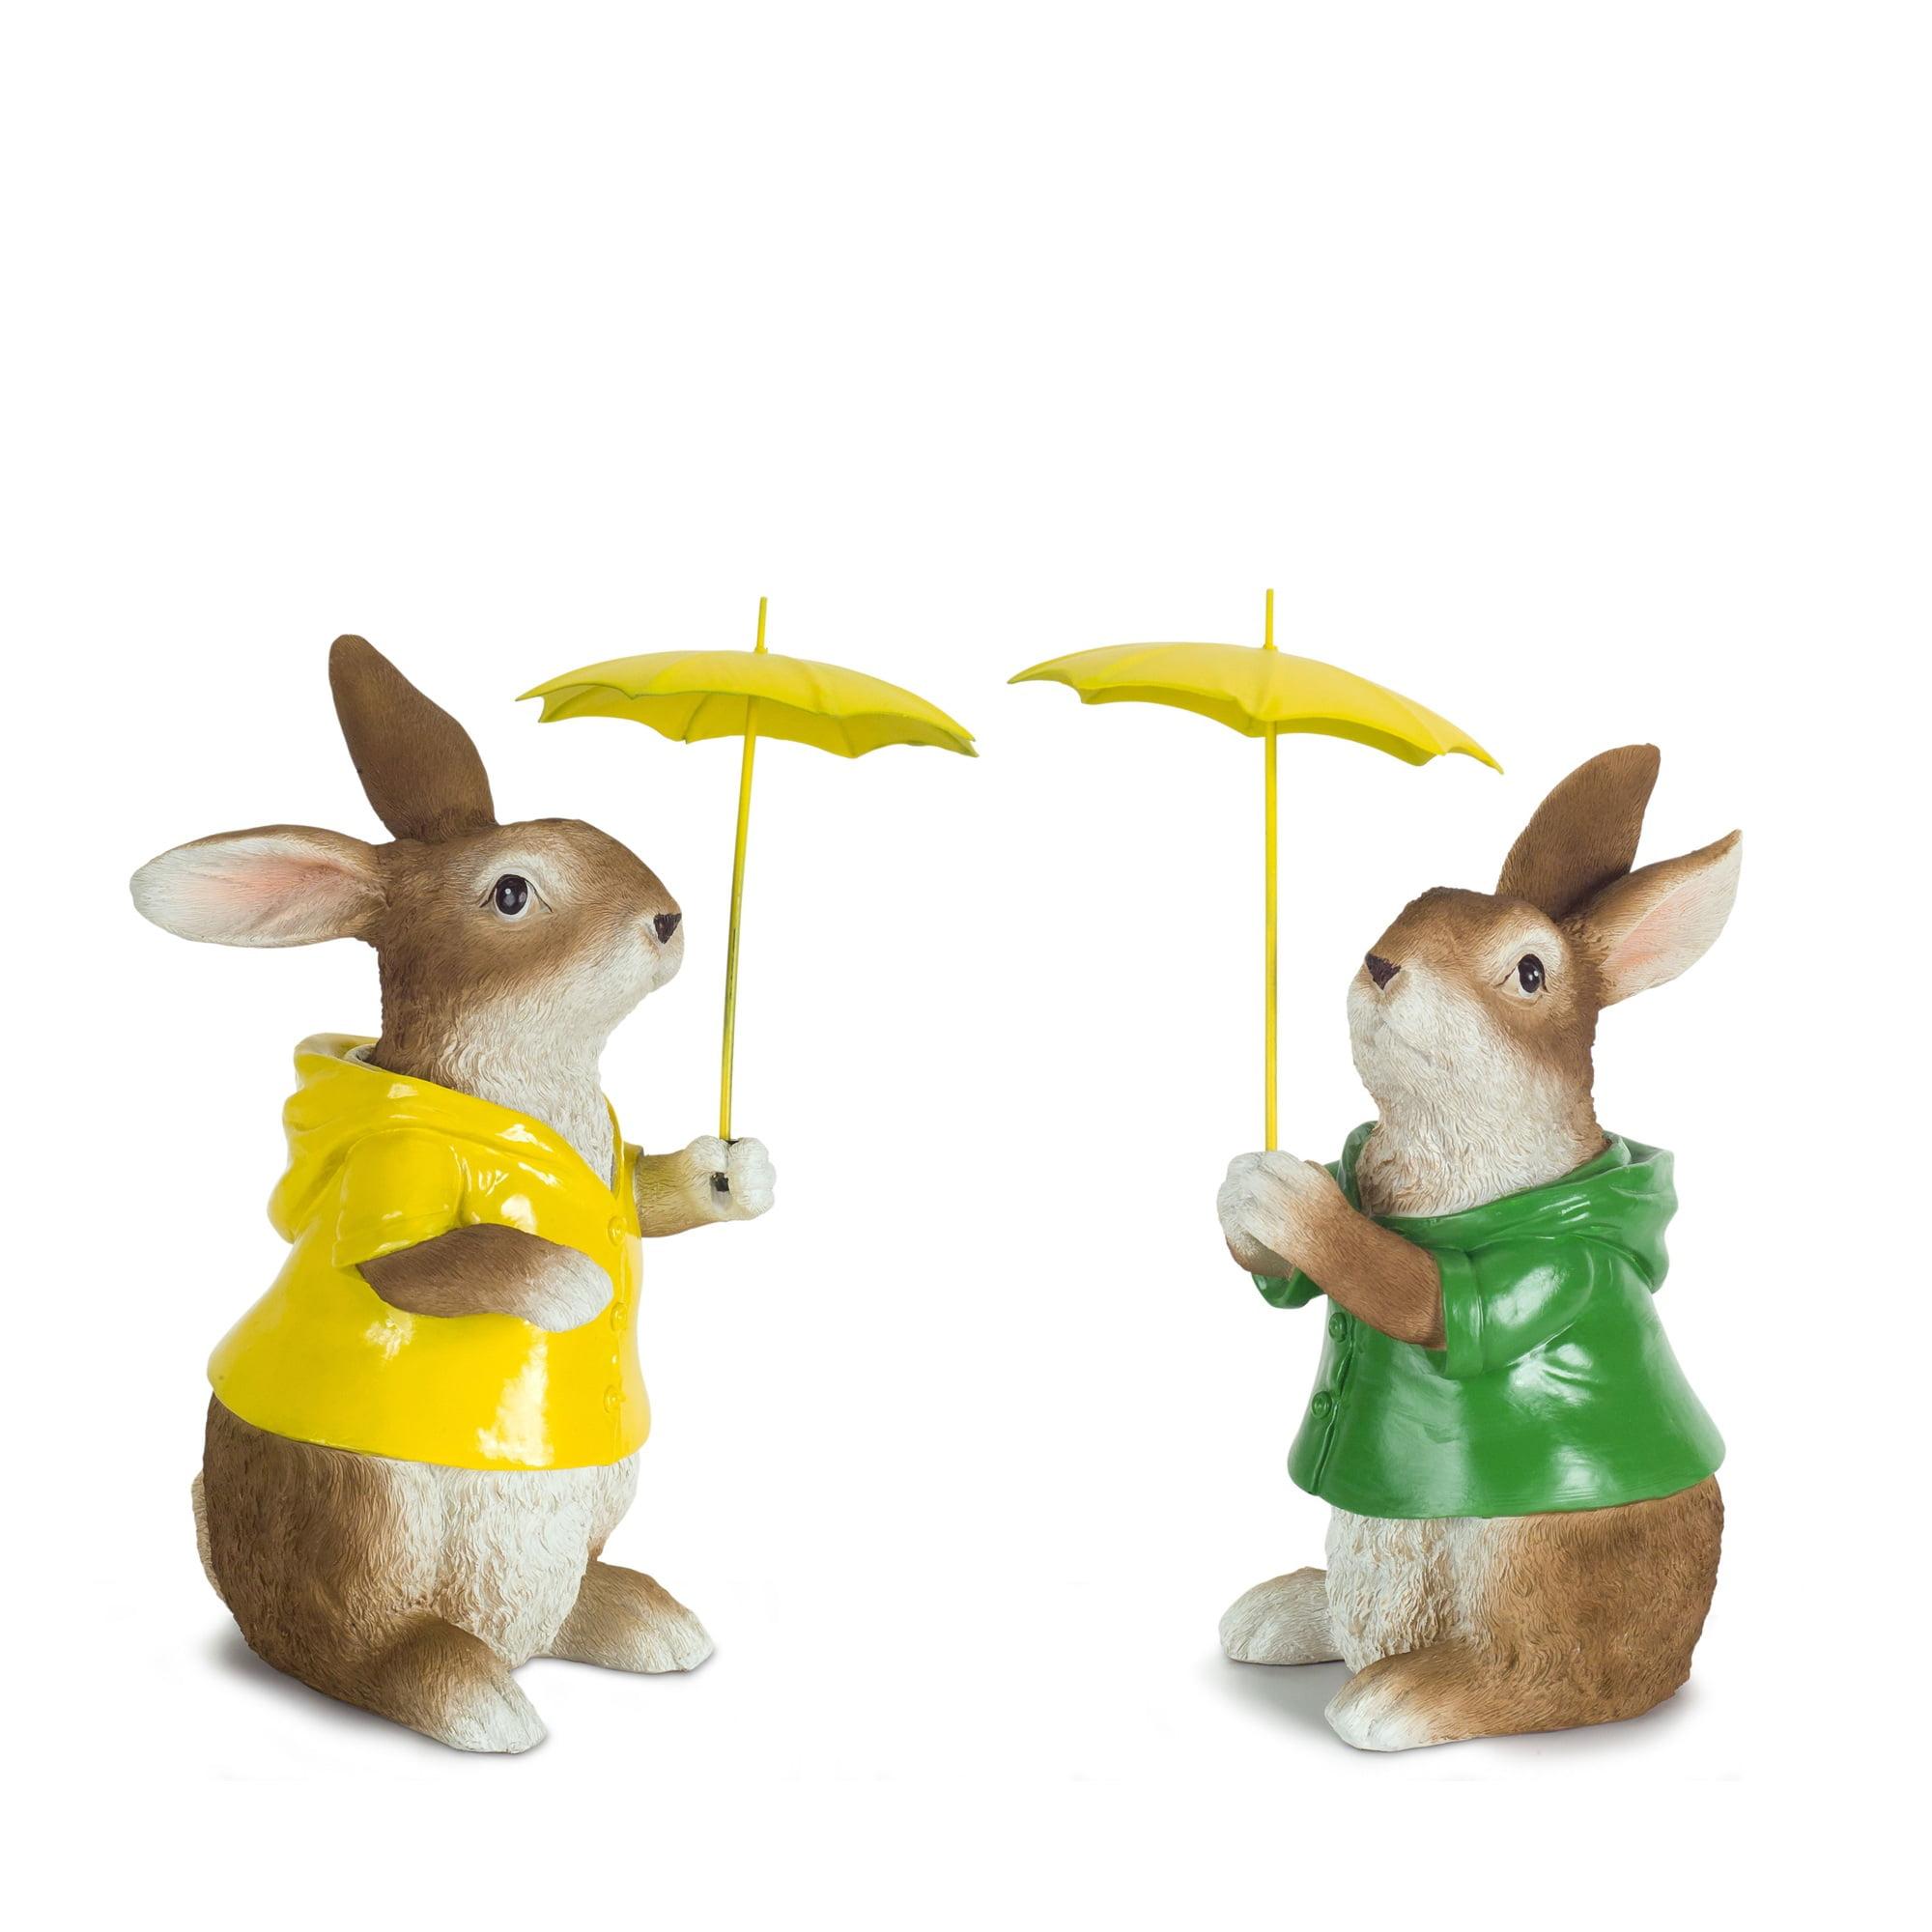 "Set of 4 Rabbits with Raincoats and Yellow Umbrella 8.25"""